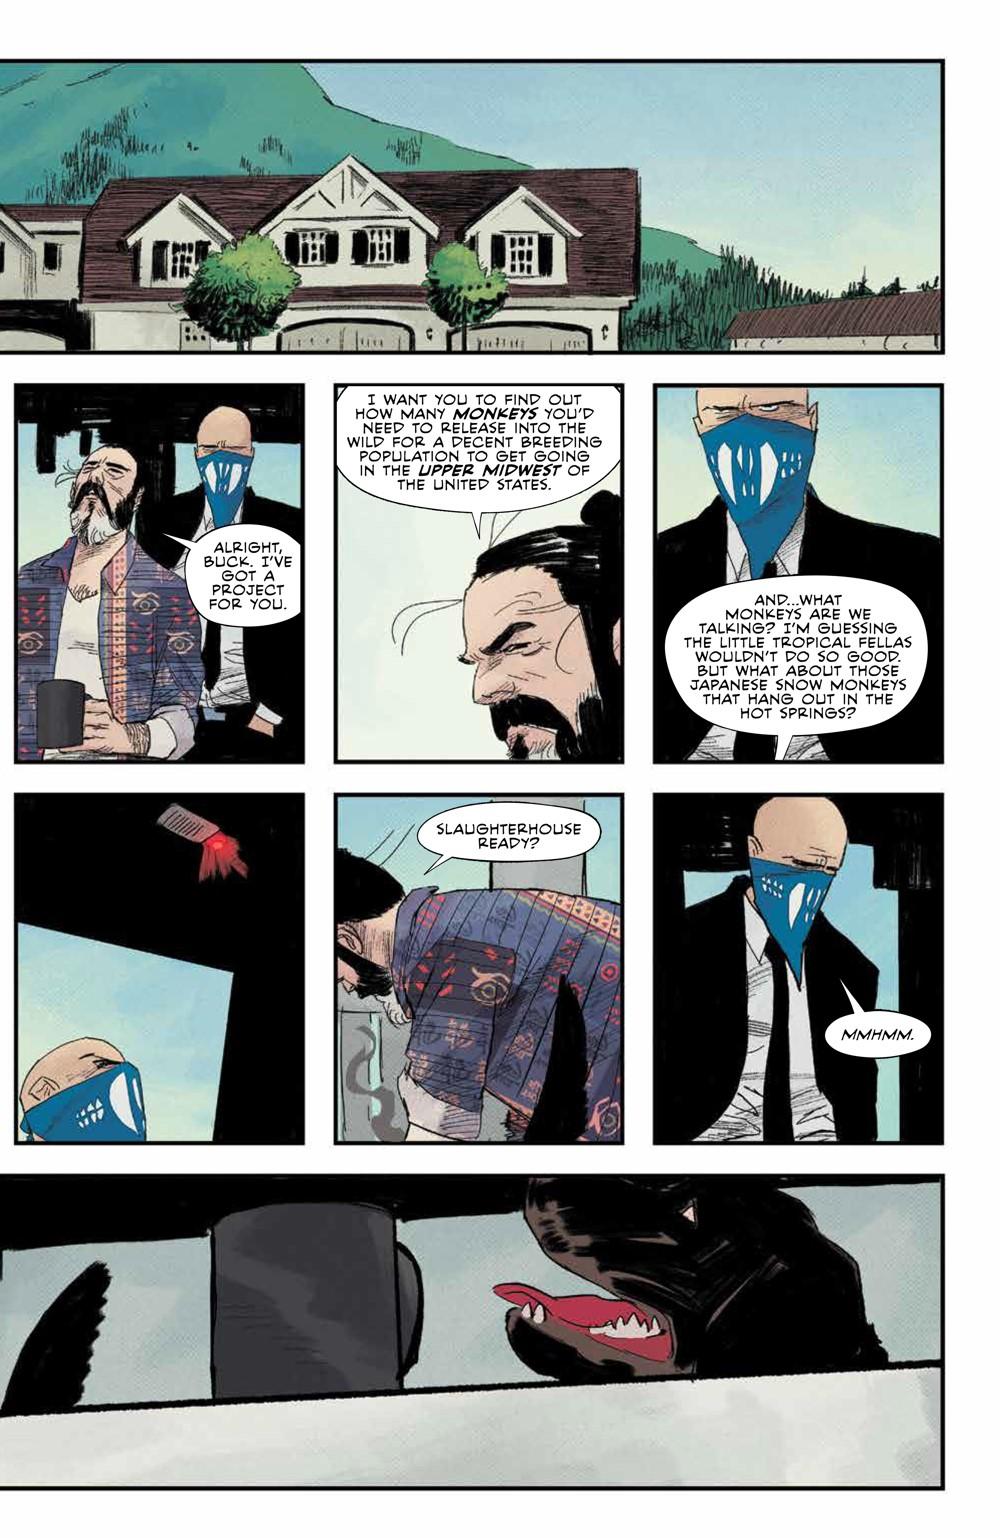 SomethingKillingChildren_018_PRESS_7 ComicList Previews: SOMETHING IS KILLING THE CHILDREN #18